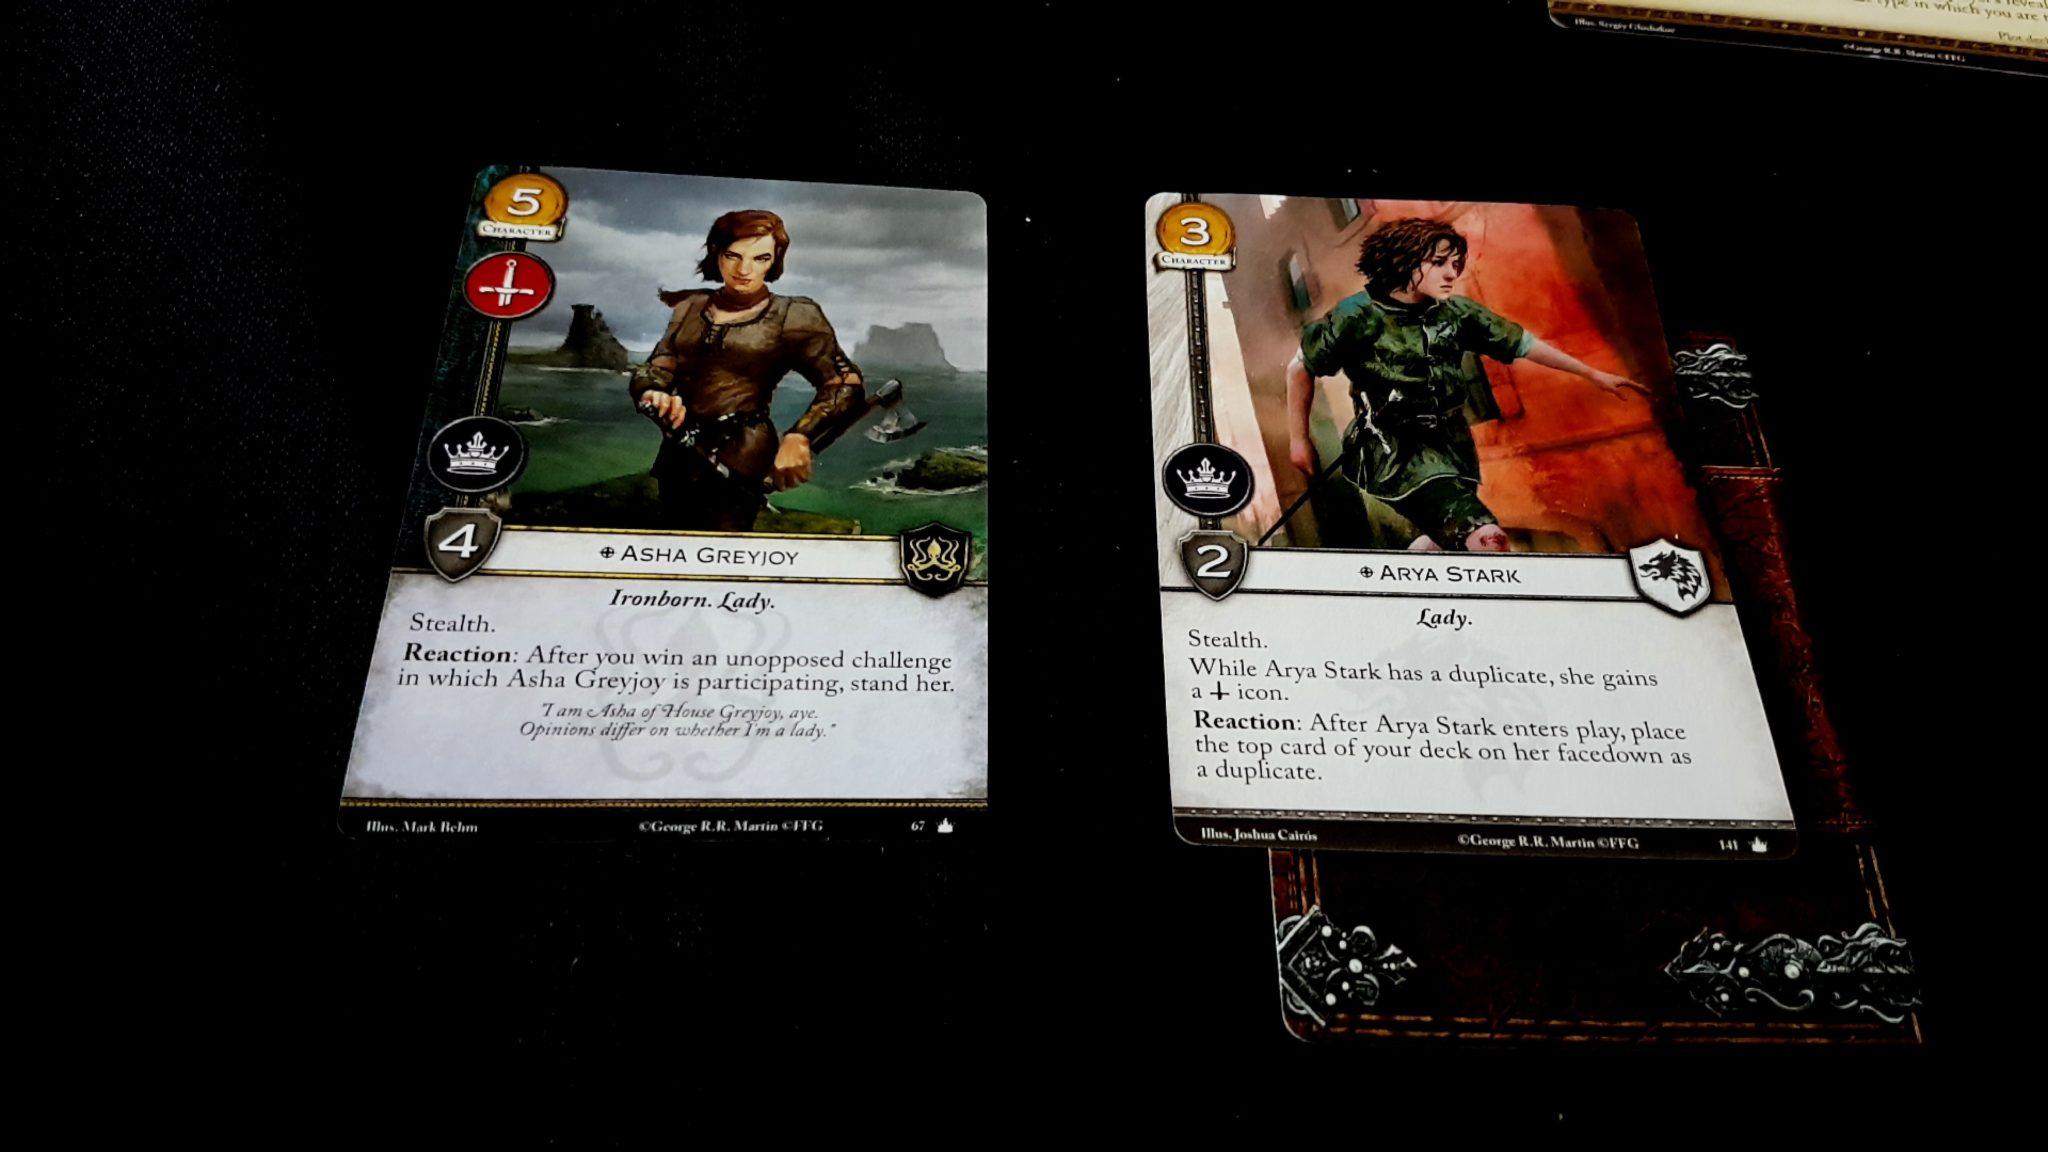 Stark cards